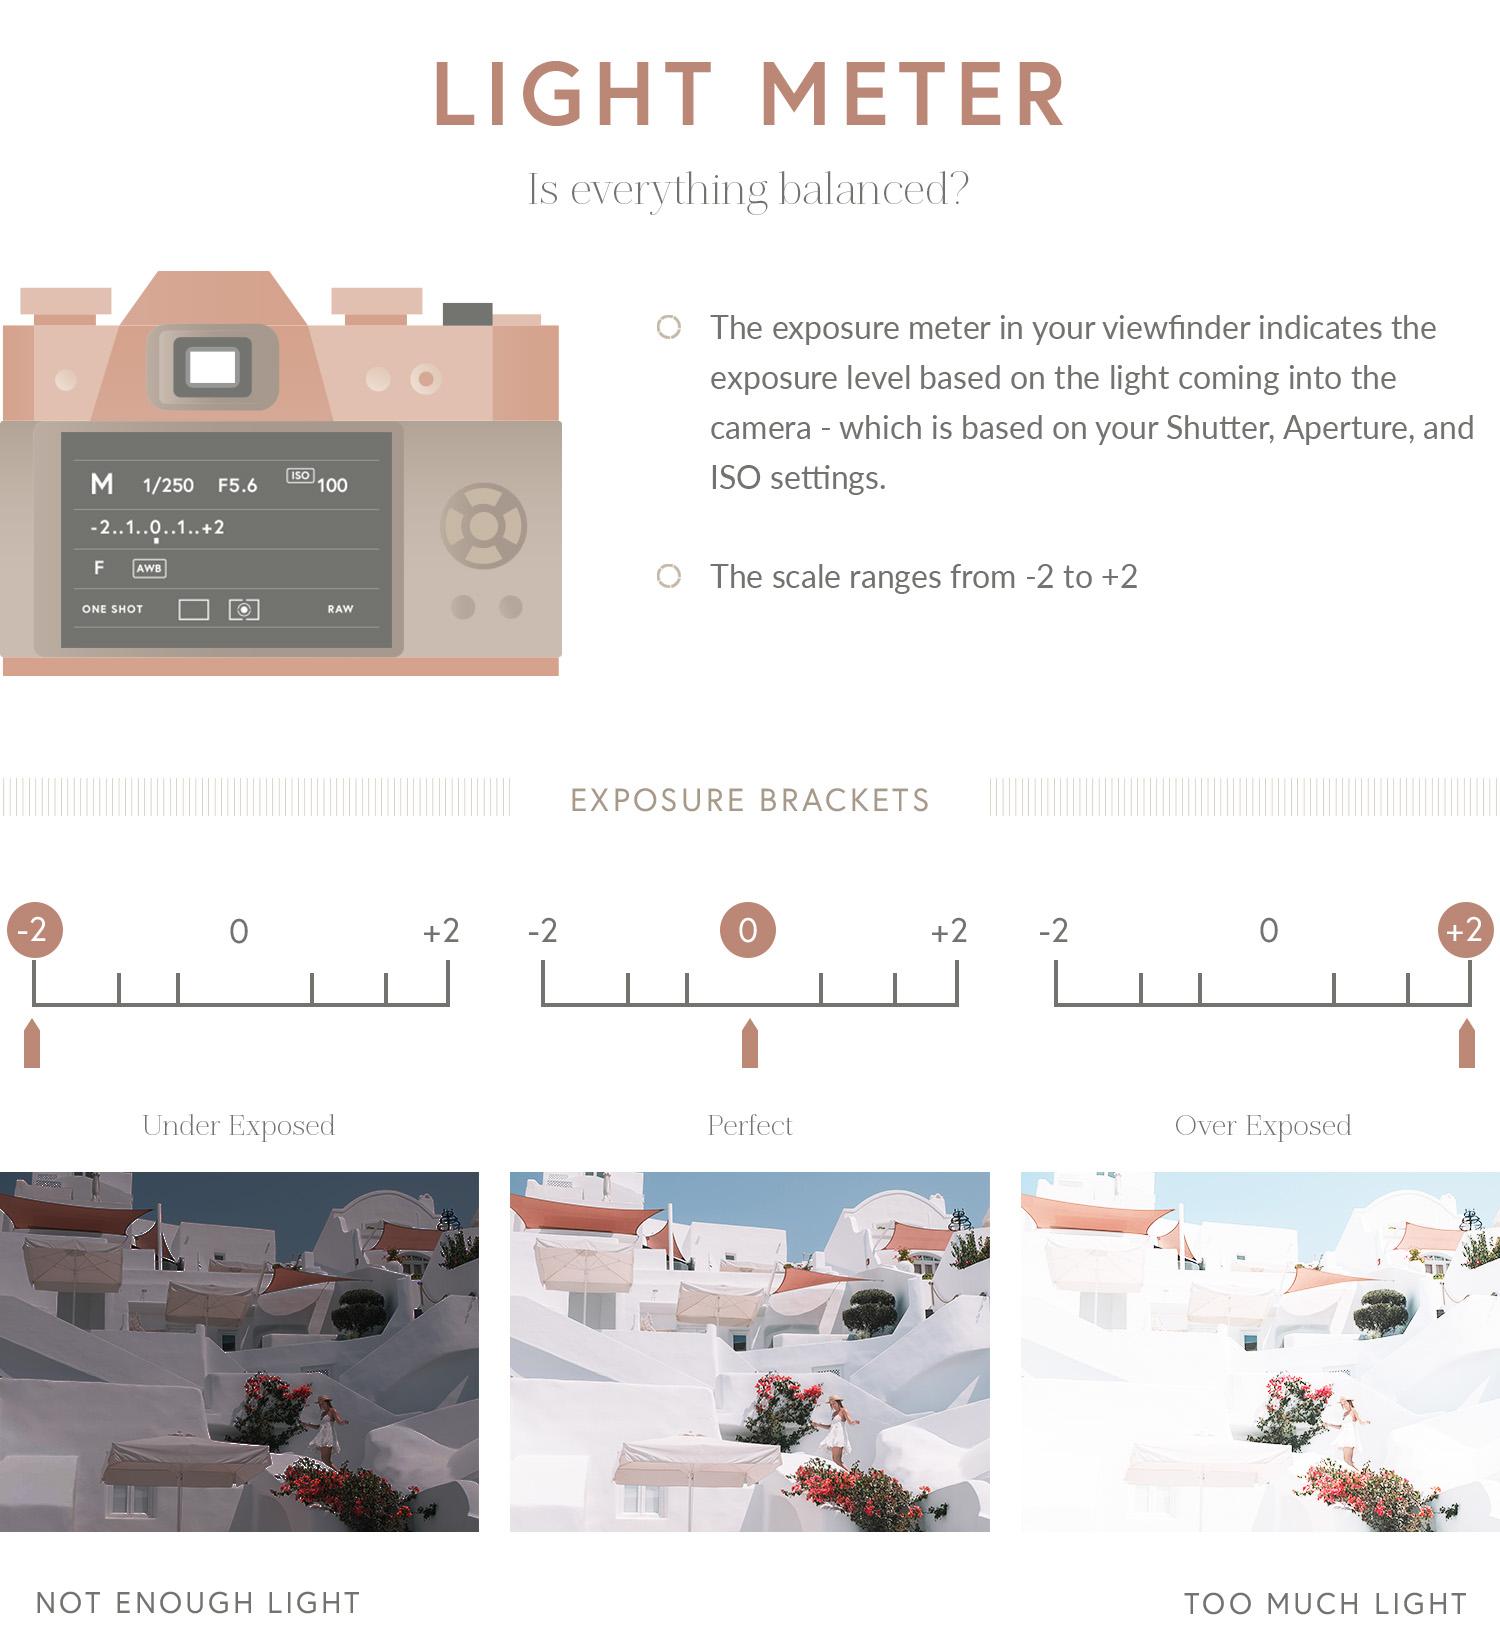 light meter balance